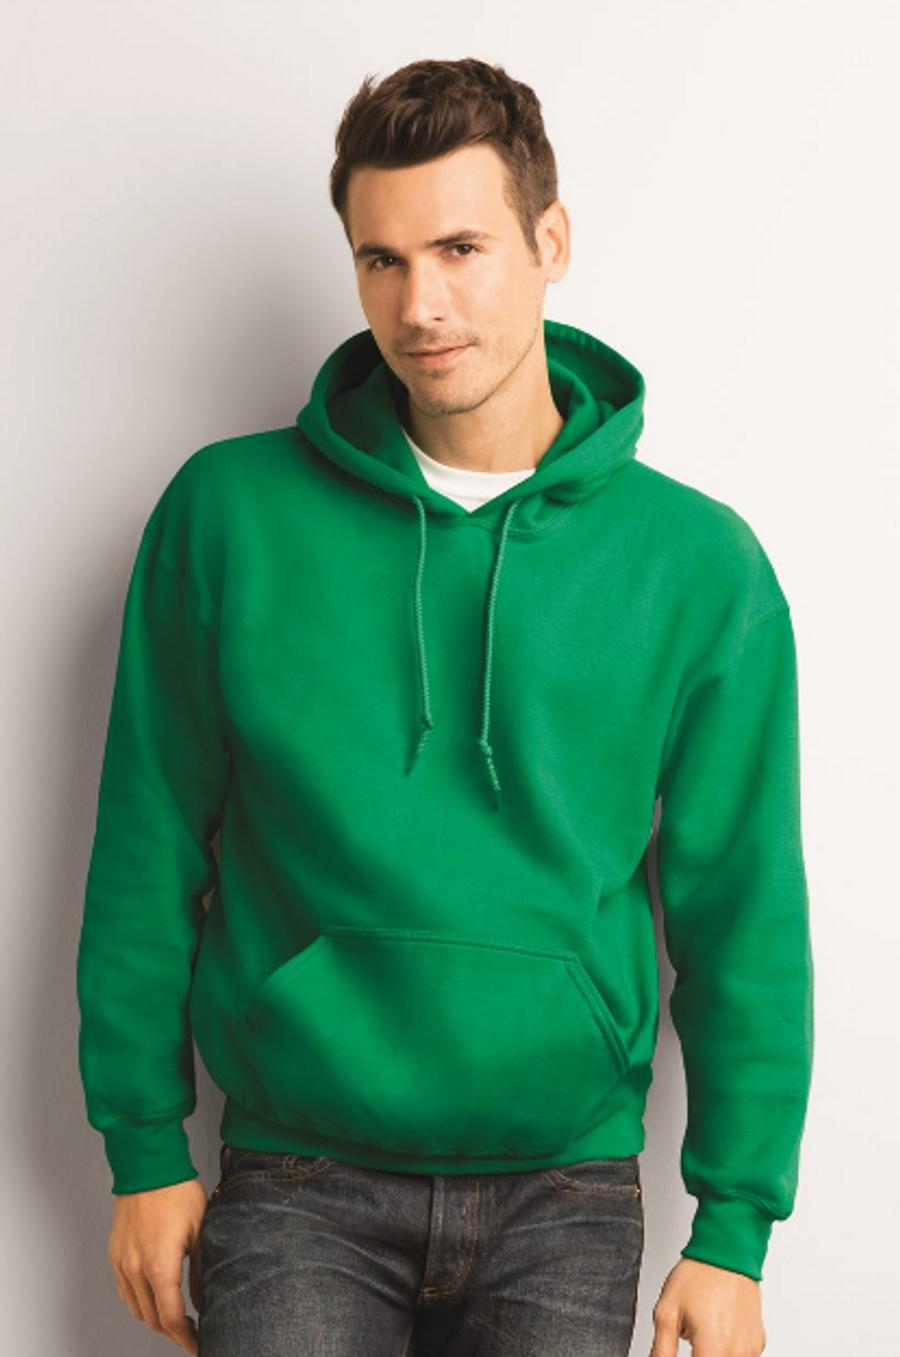 Gildan Hooded Sweatshirts ($10.00-5.50)